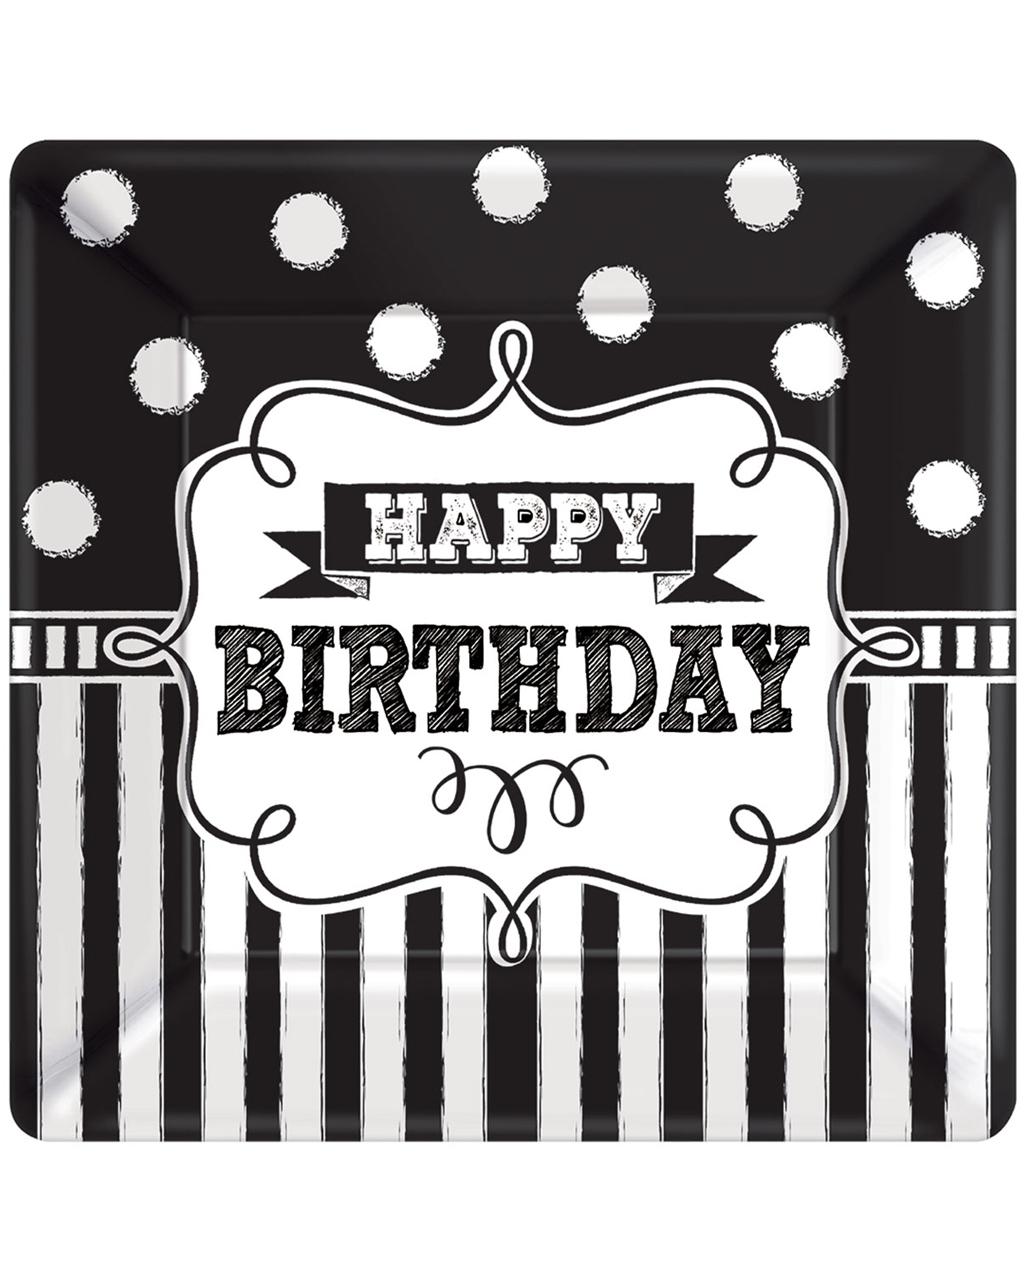 Happy Birthday Paper Plate Black-white 8 Pcs. to buy | horror-shop.com